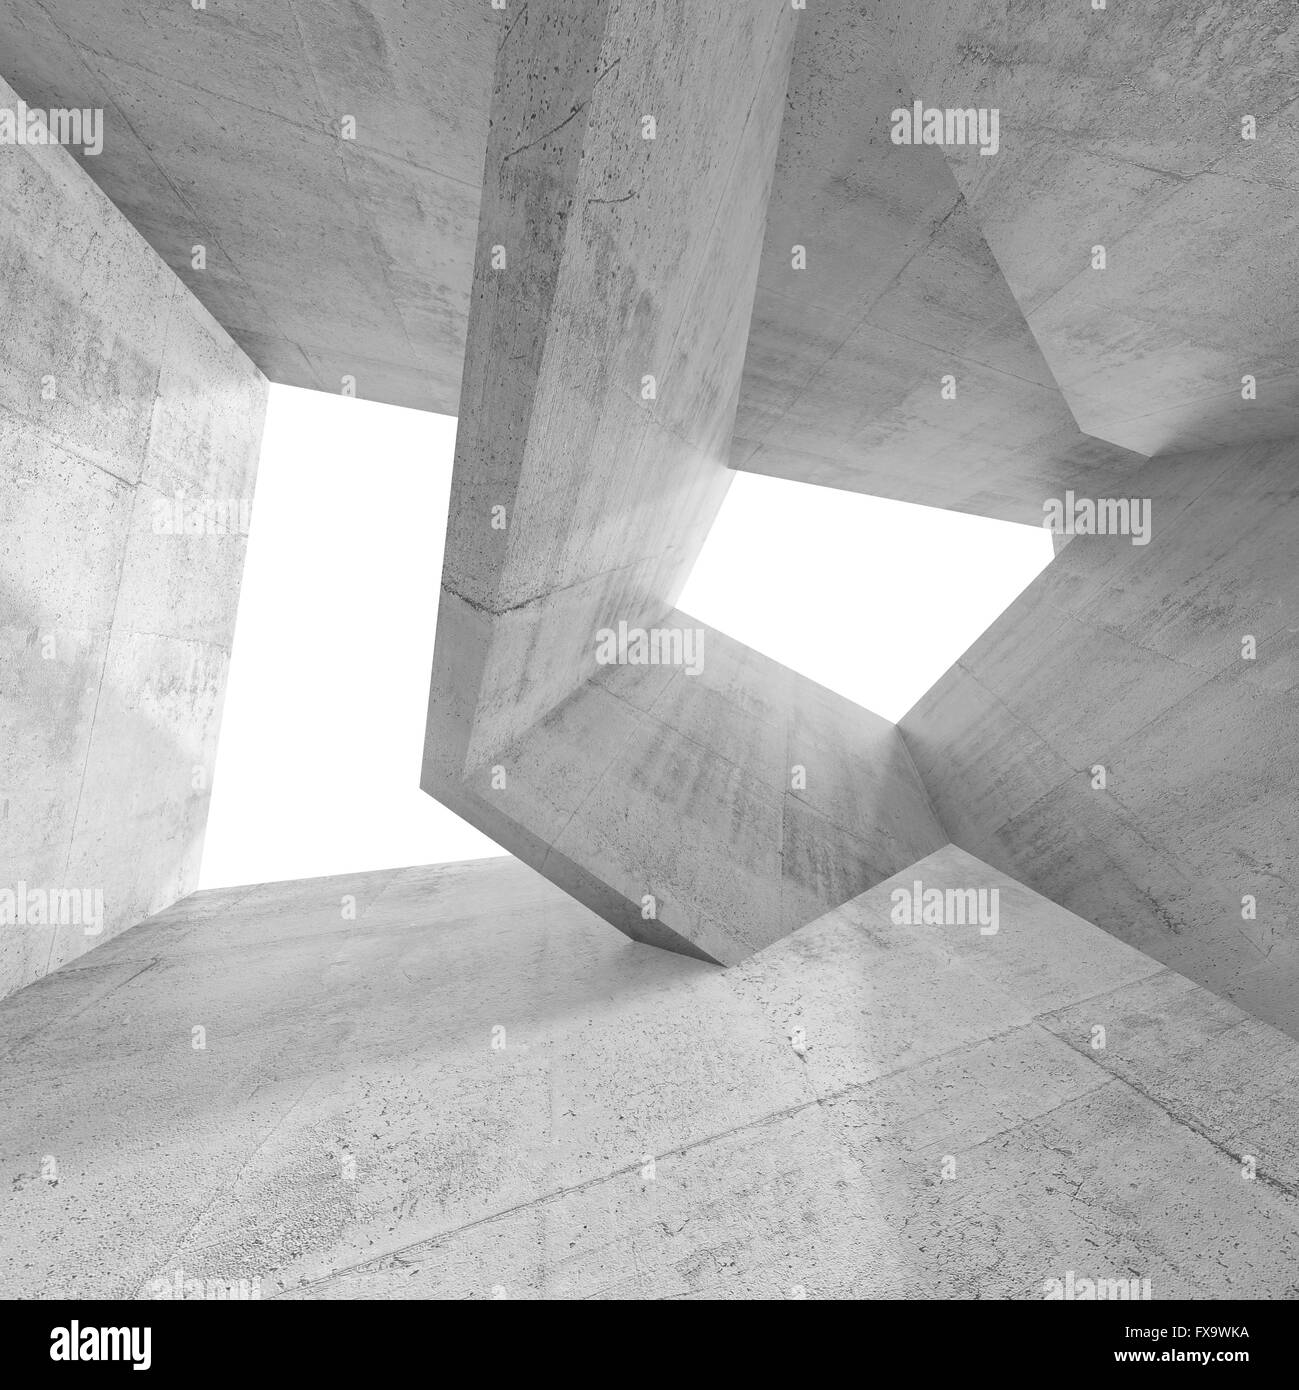 Concrete Interior Design abstract empty concrete interior design with windows and chaotic